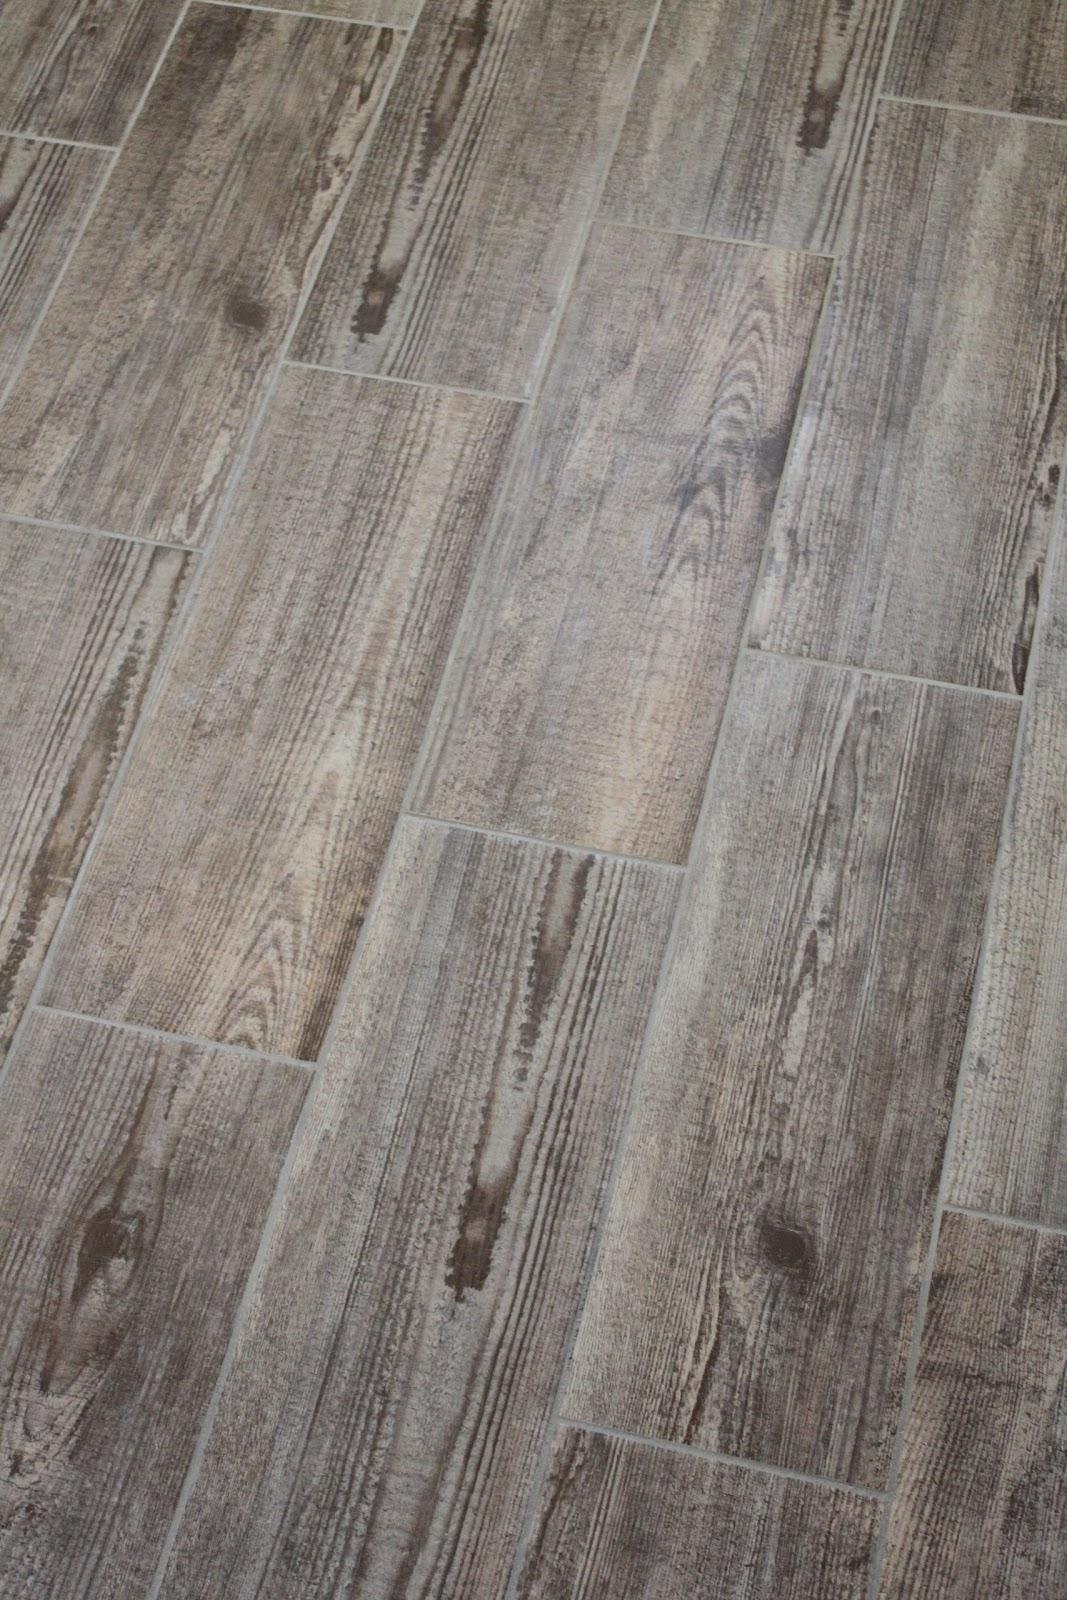 30 Beautiful Bathroom Tiles That Look Like Wood | eyagci.com